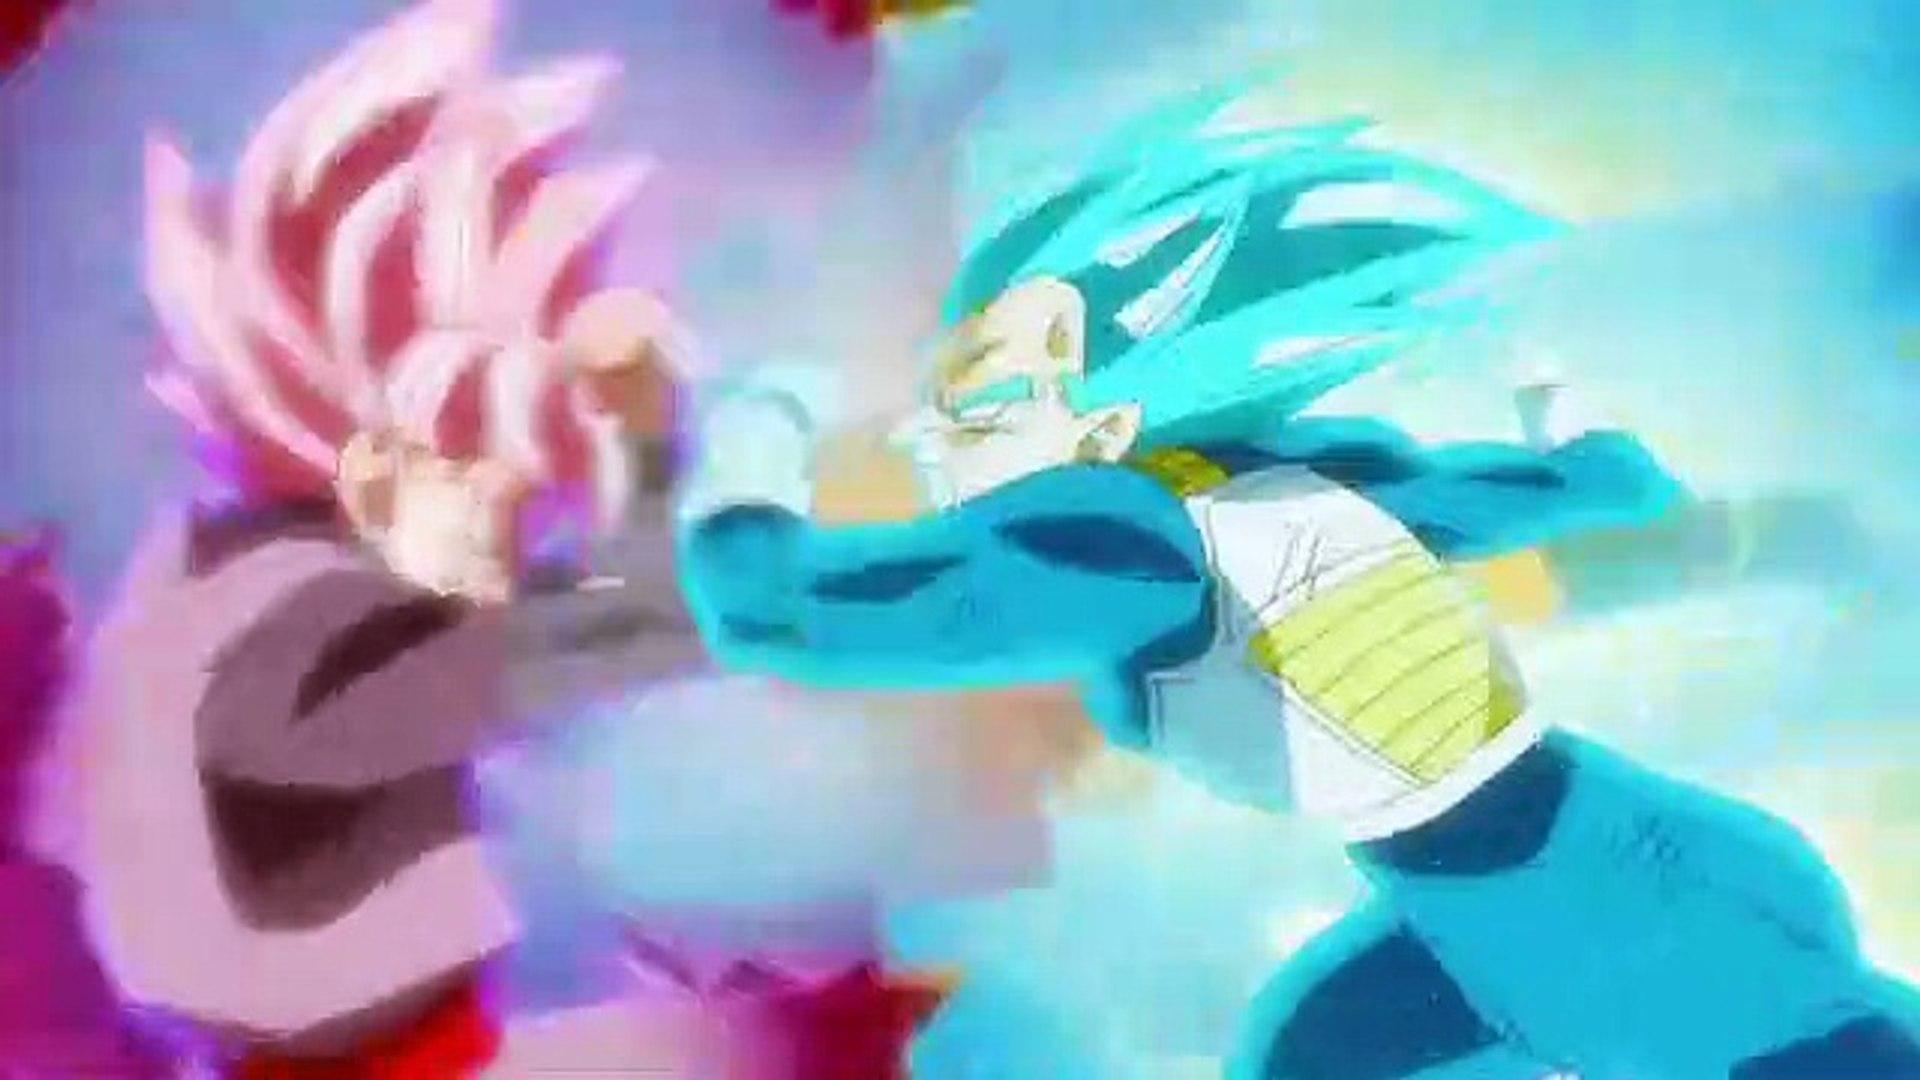 Black Goku Vegeta Wallpaper Gambarku